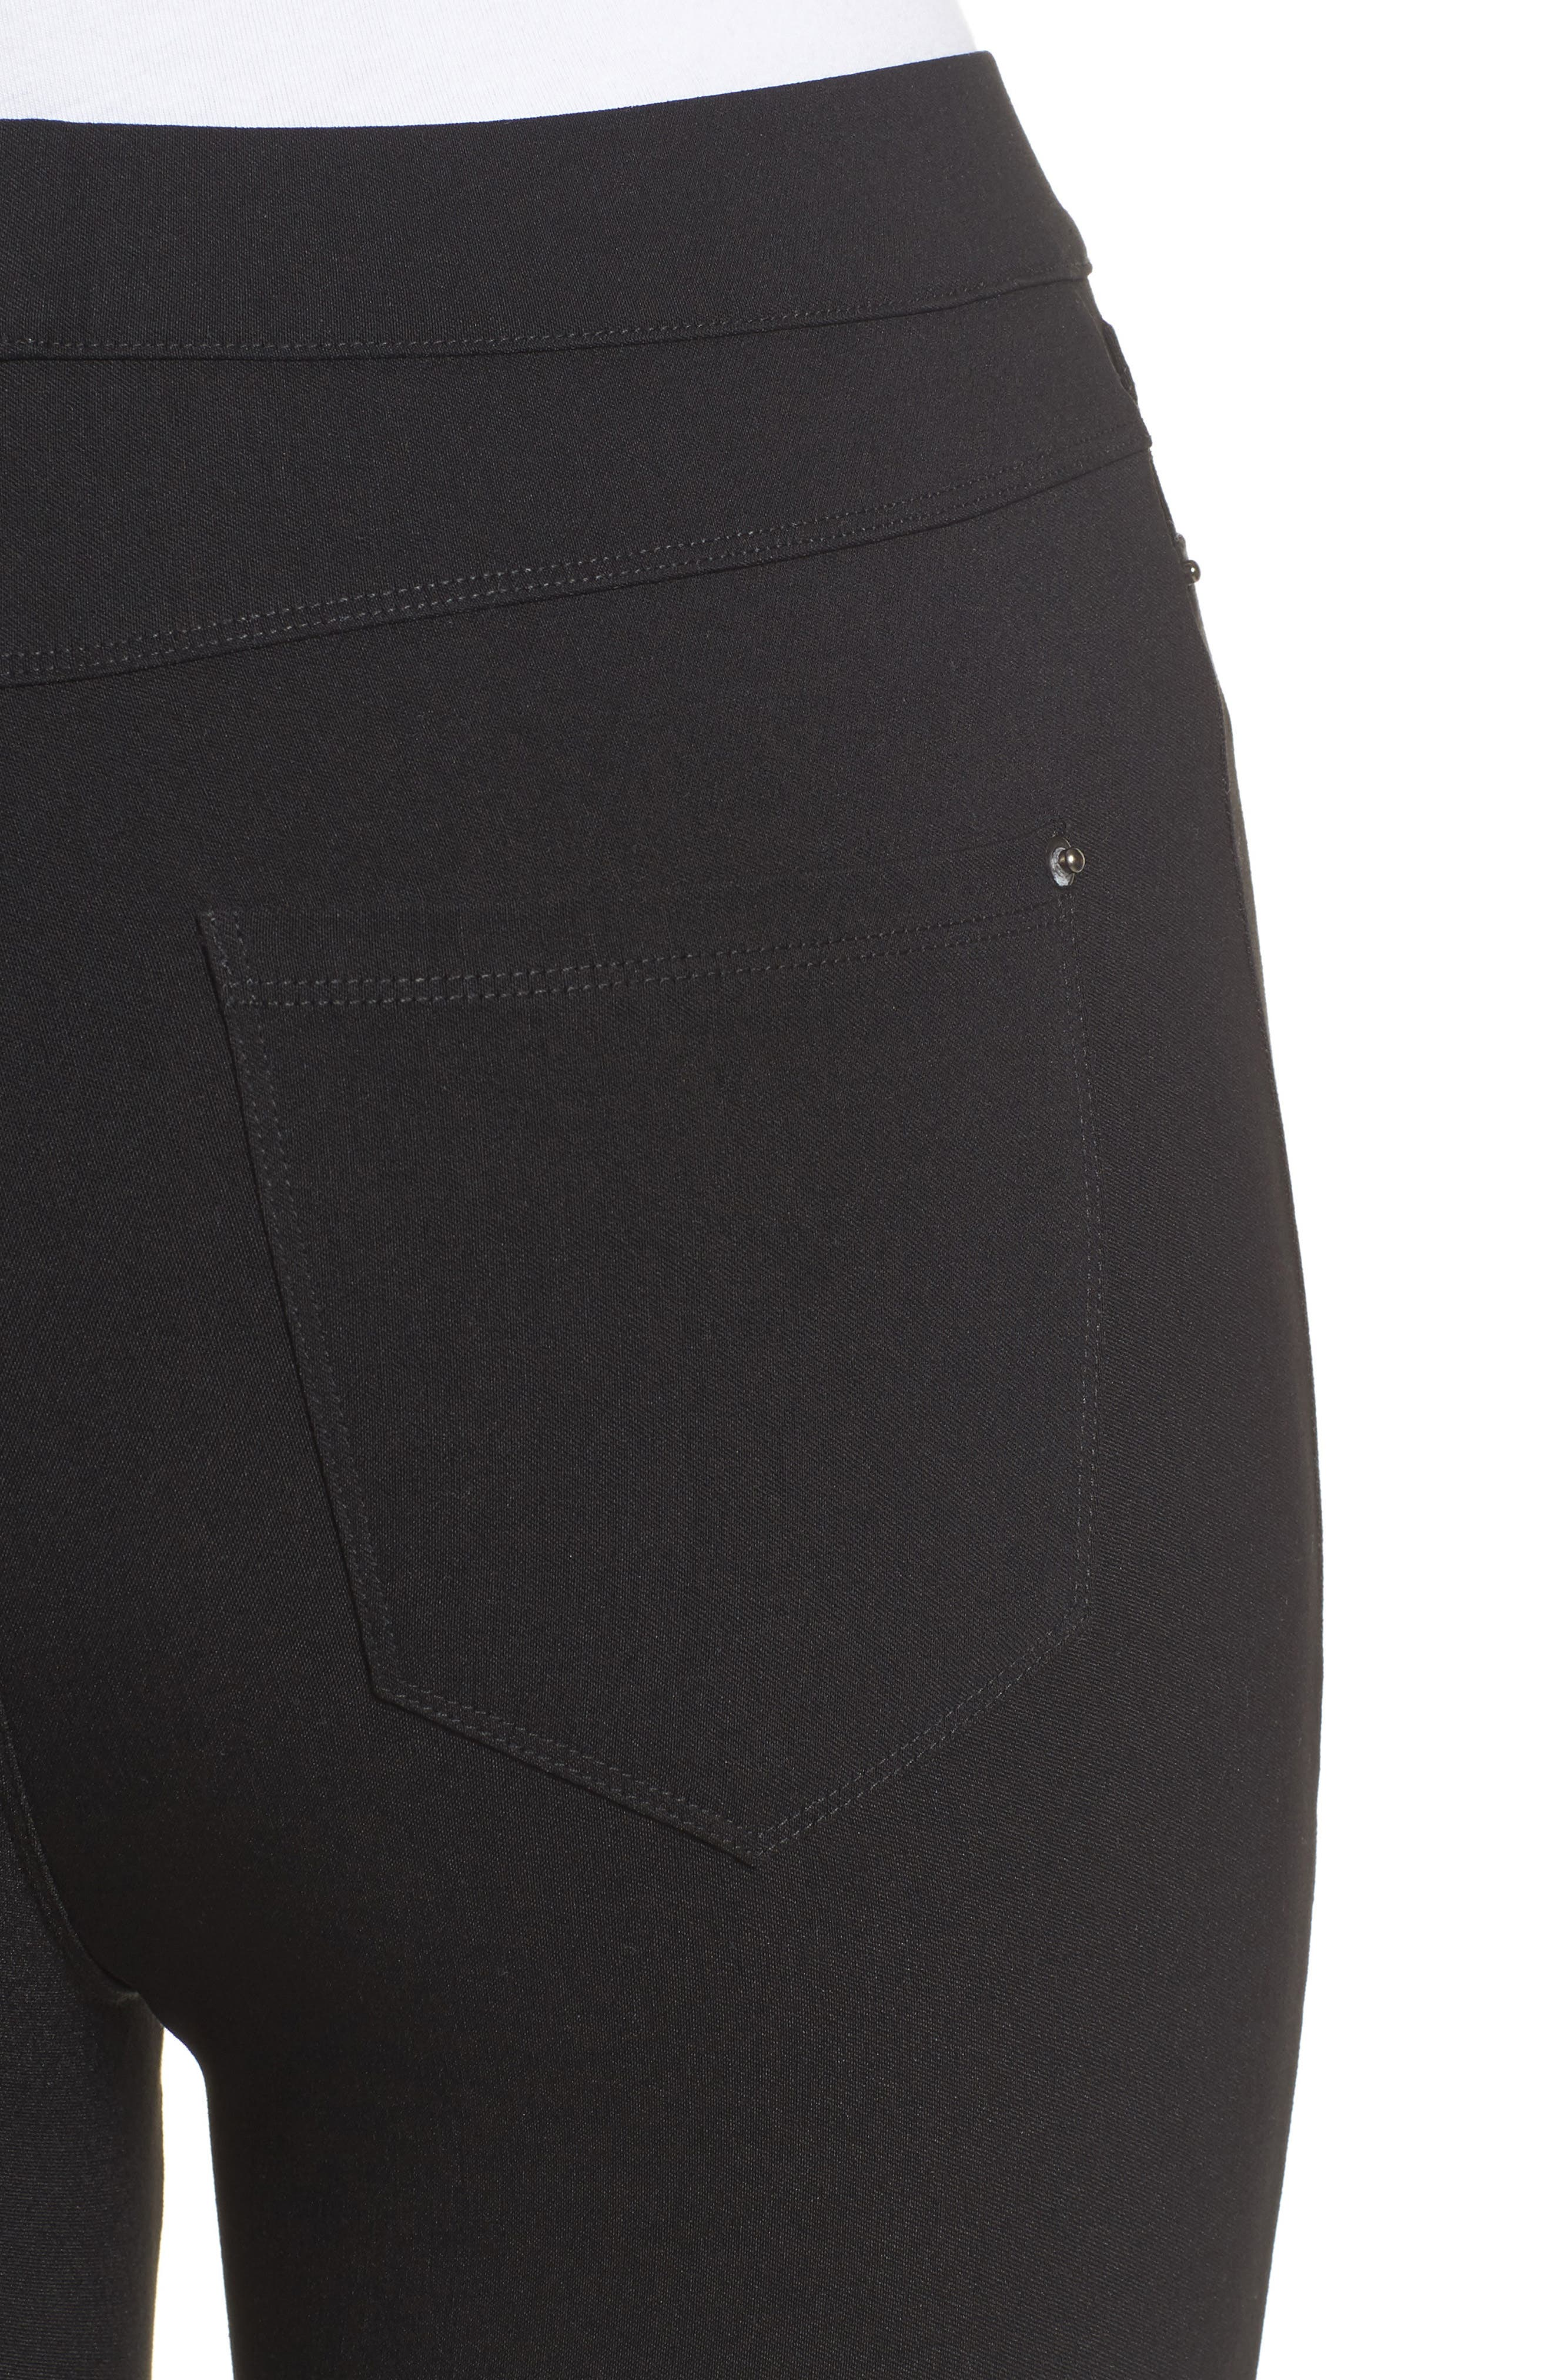 Legging Jeans,                             Alternate thumbnail 4, color,                             001